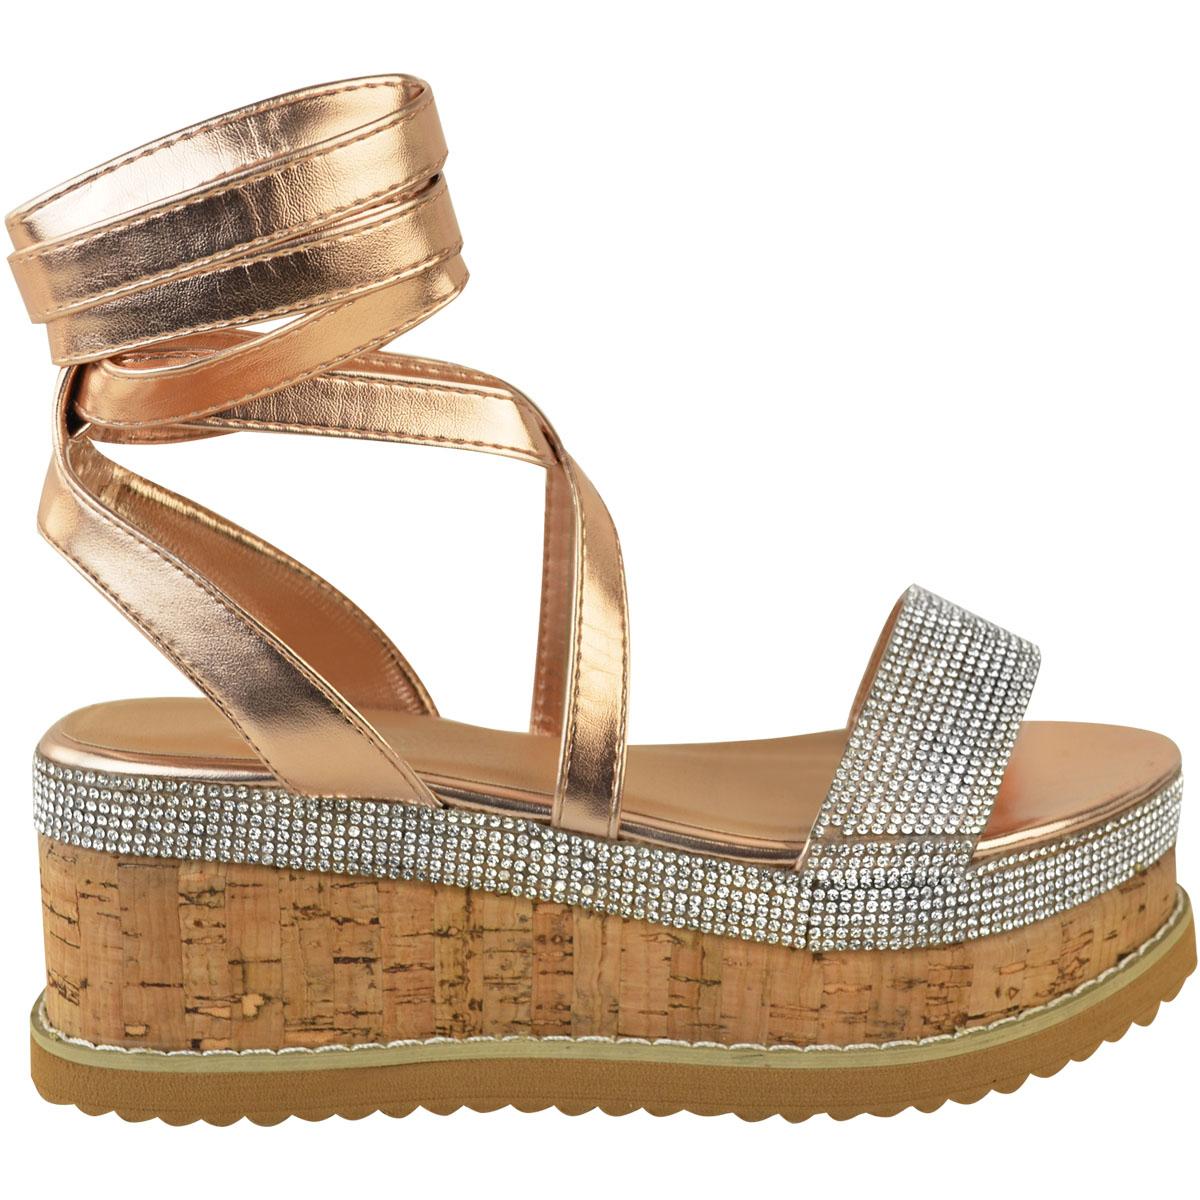 Womens-Ladies-Flatform-Diamante-Wedge-Sandals-Platform-Ankle-Lace-Up-Summer-Size thumbnail 9